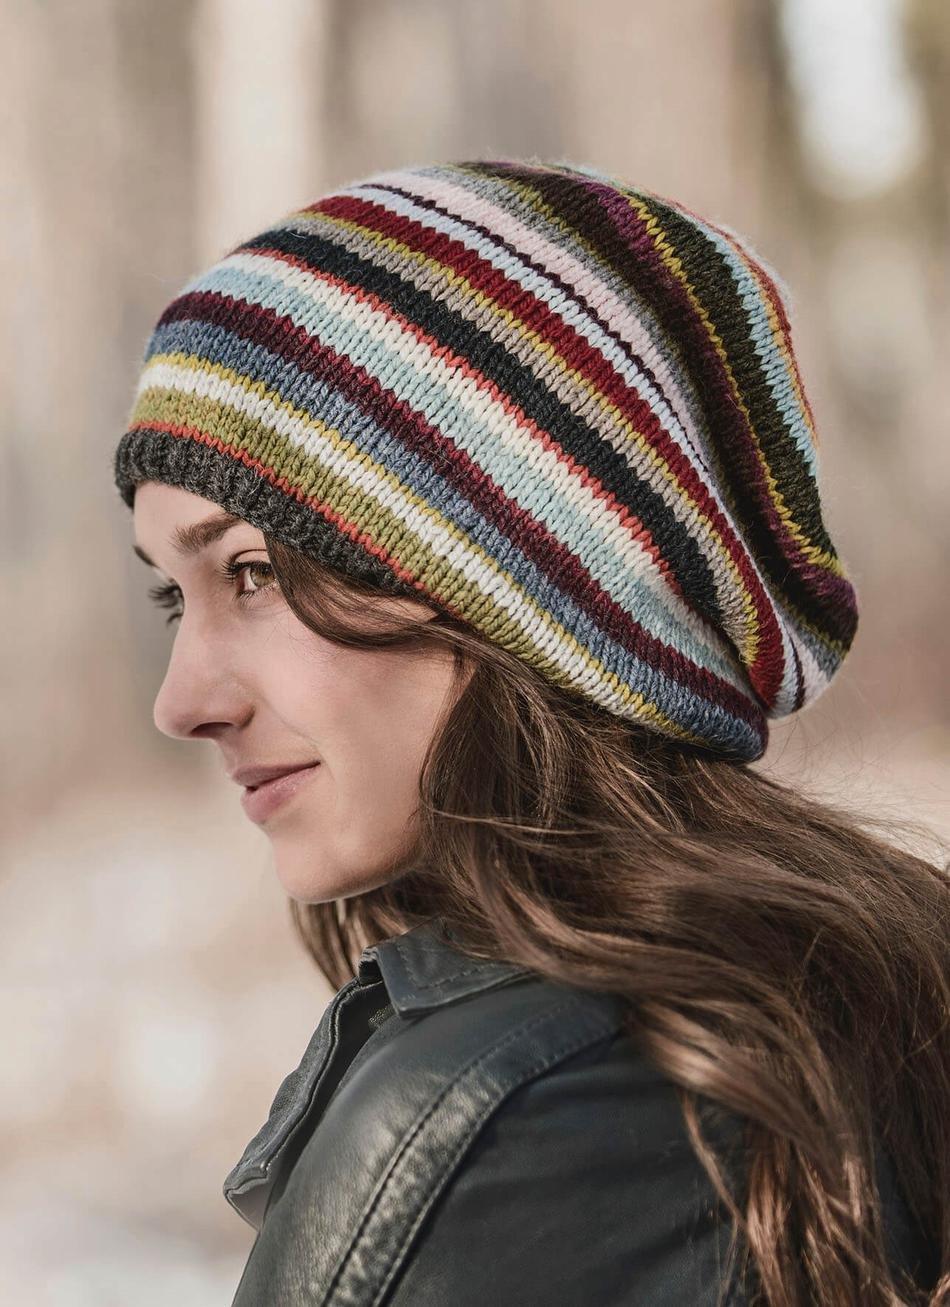 21 Color Slouch Hat Kit